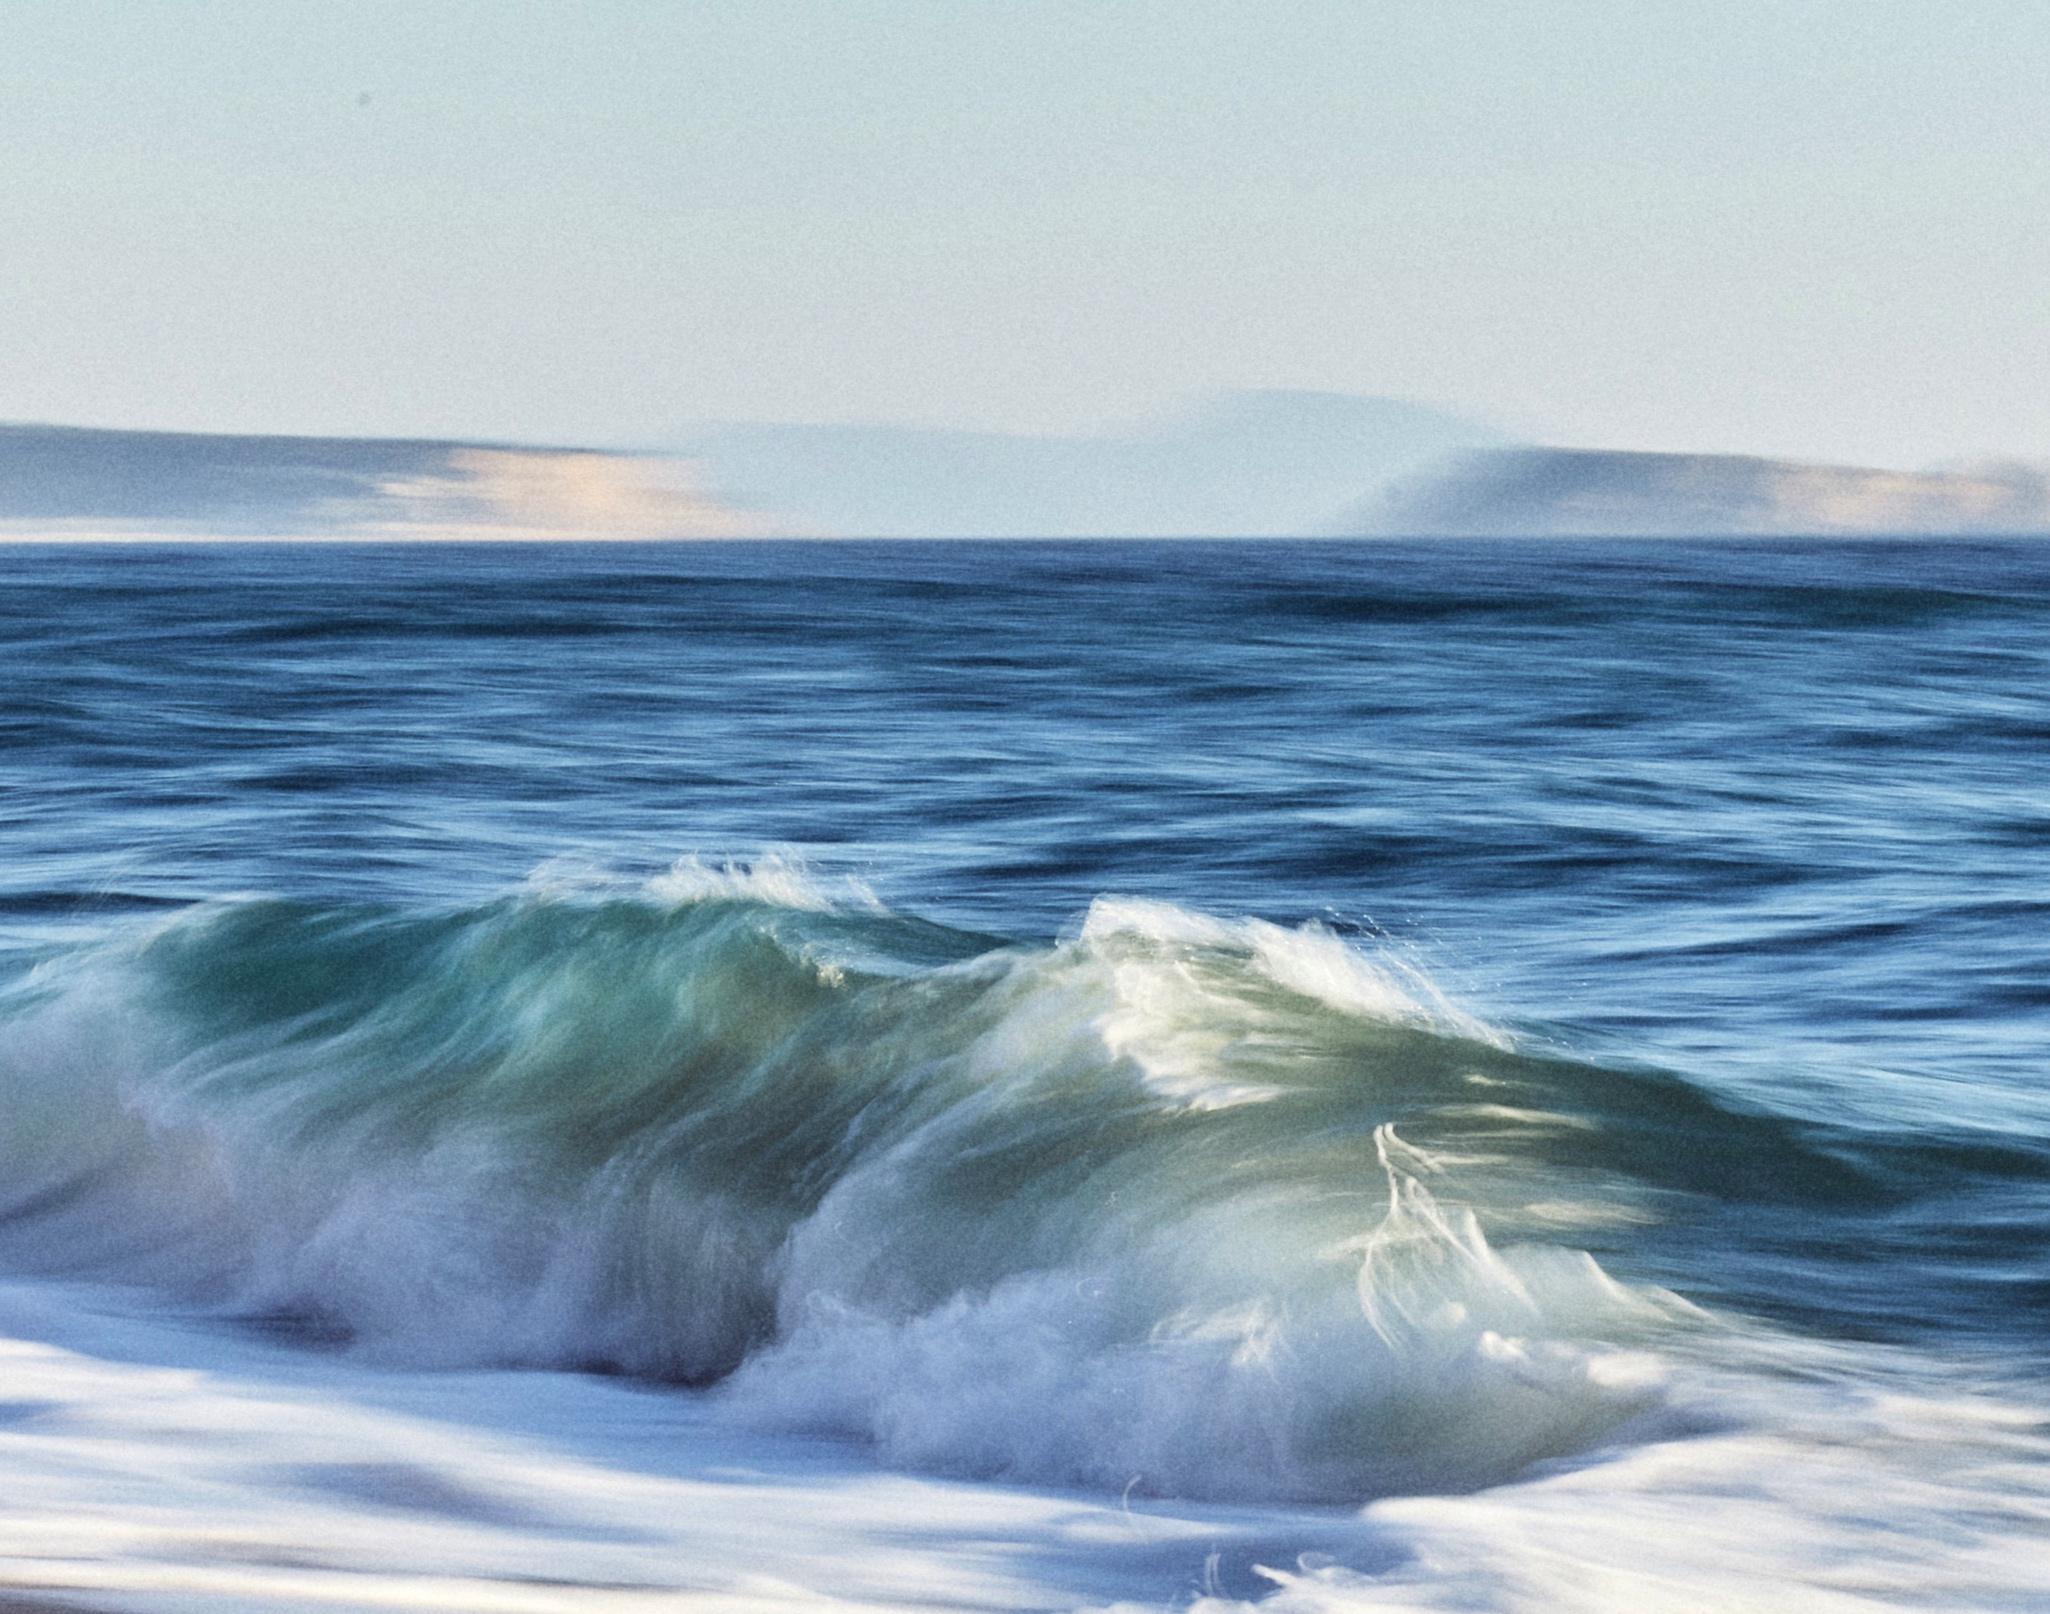 Blaus+del+Mediterrani